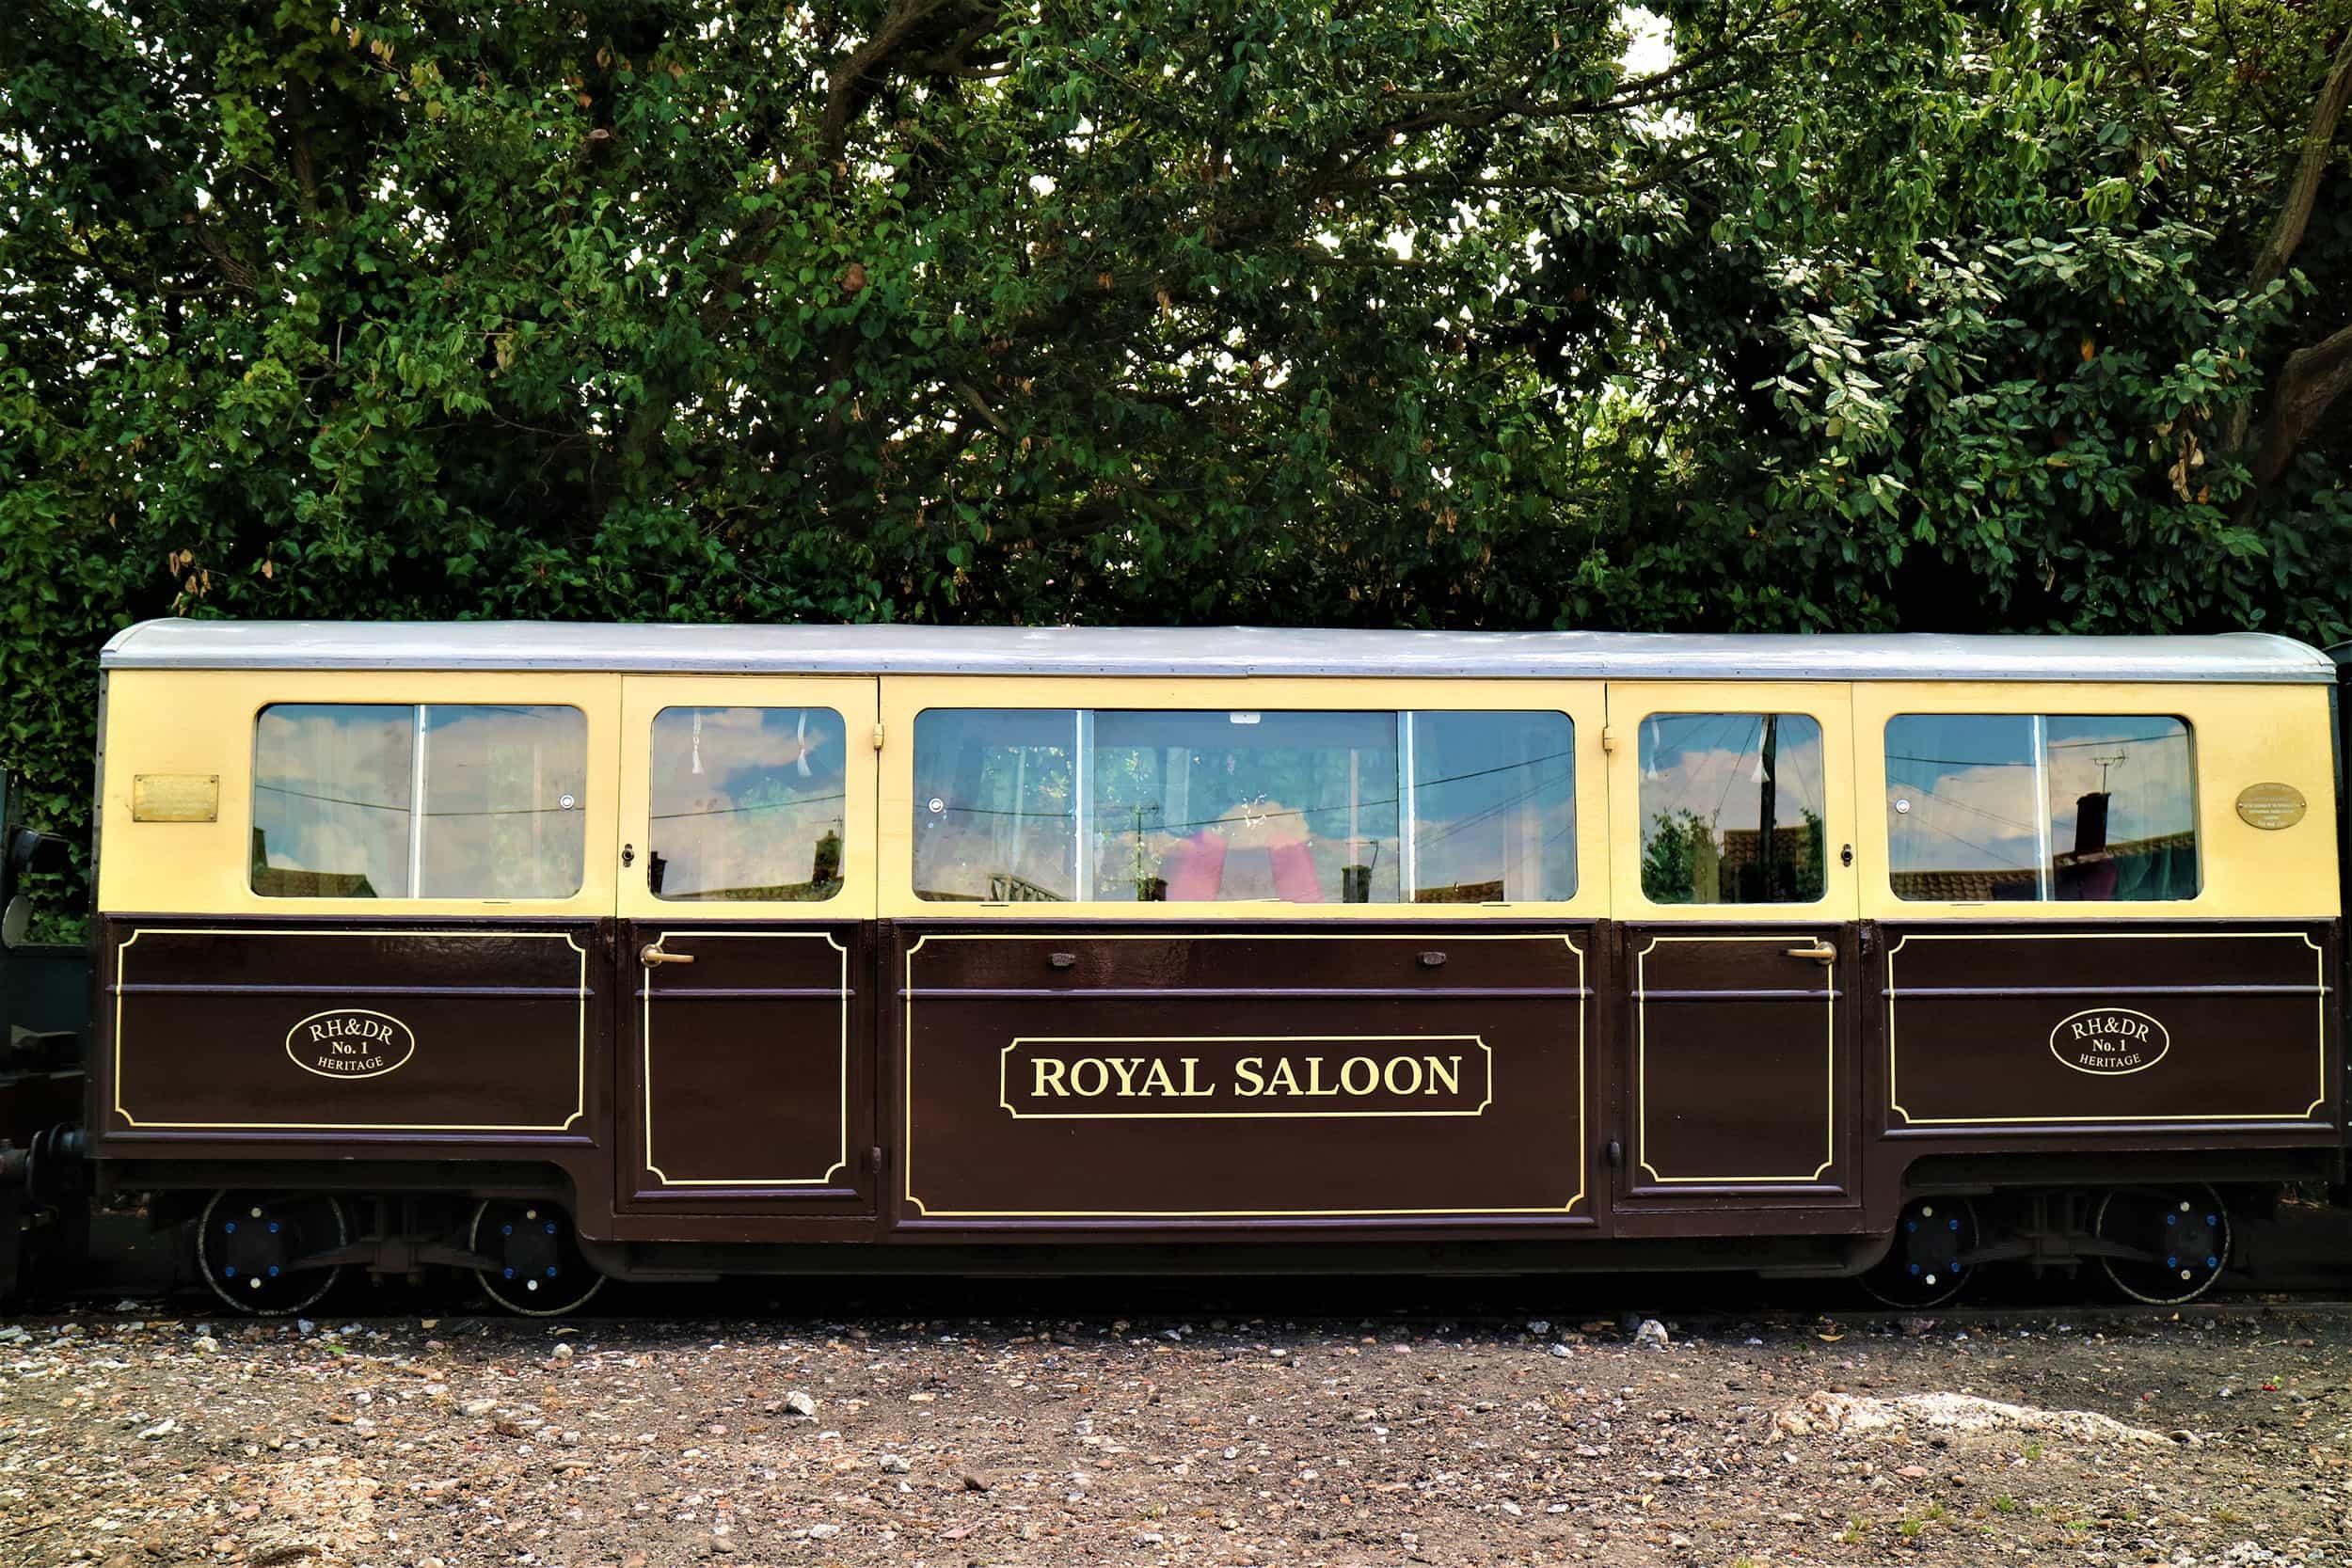 Heritage Carriage - Royal Saloon - Romney, Hythe & Dymchurch Railway